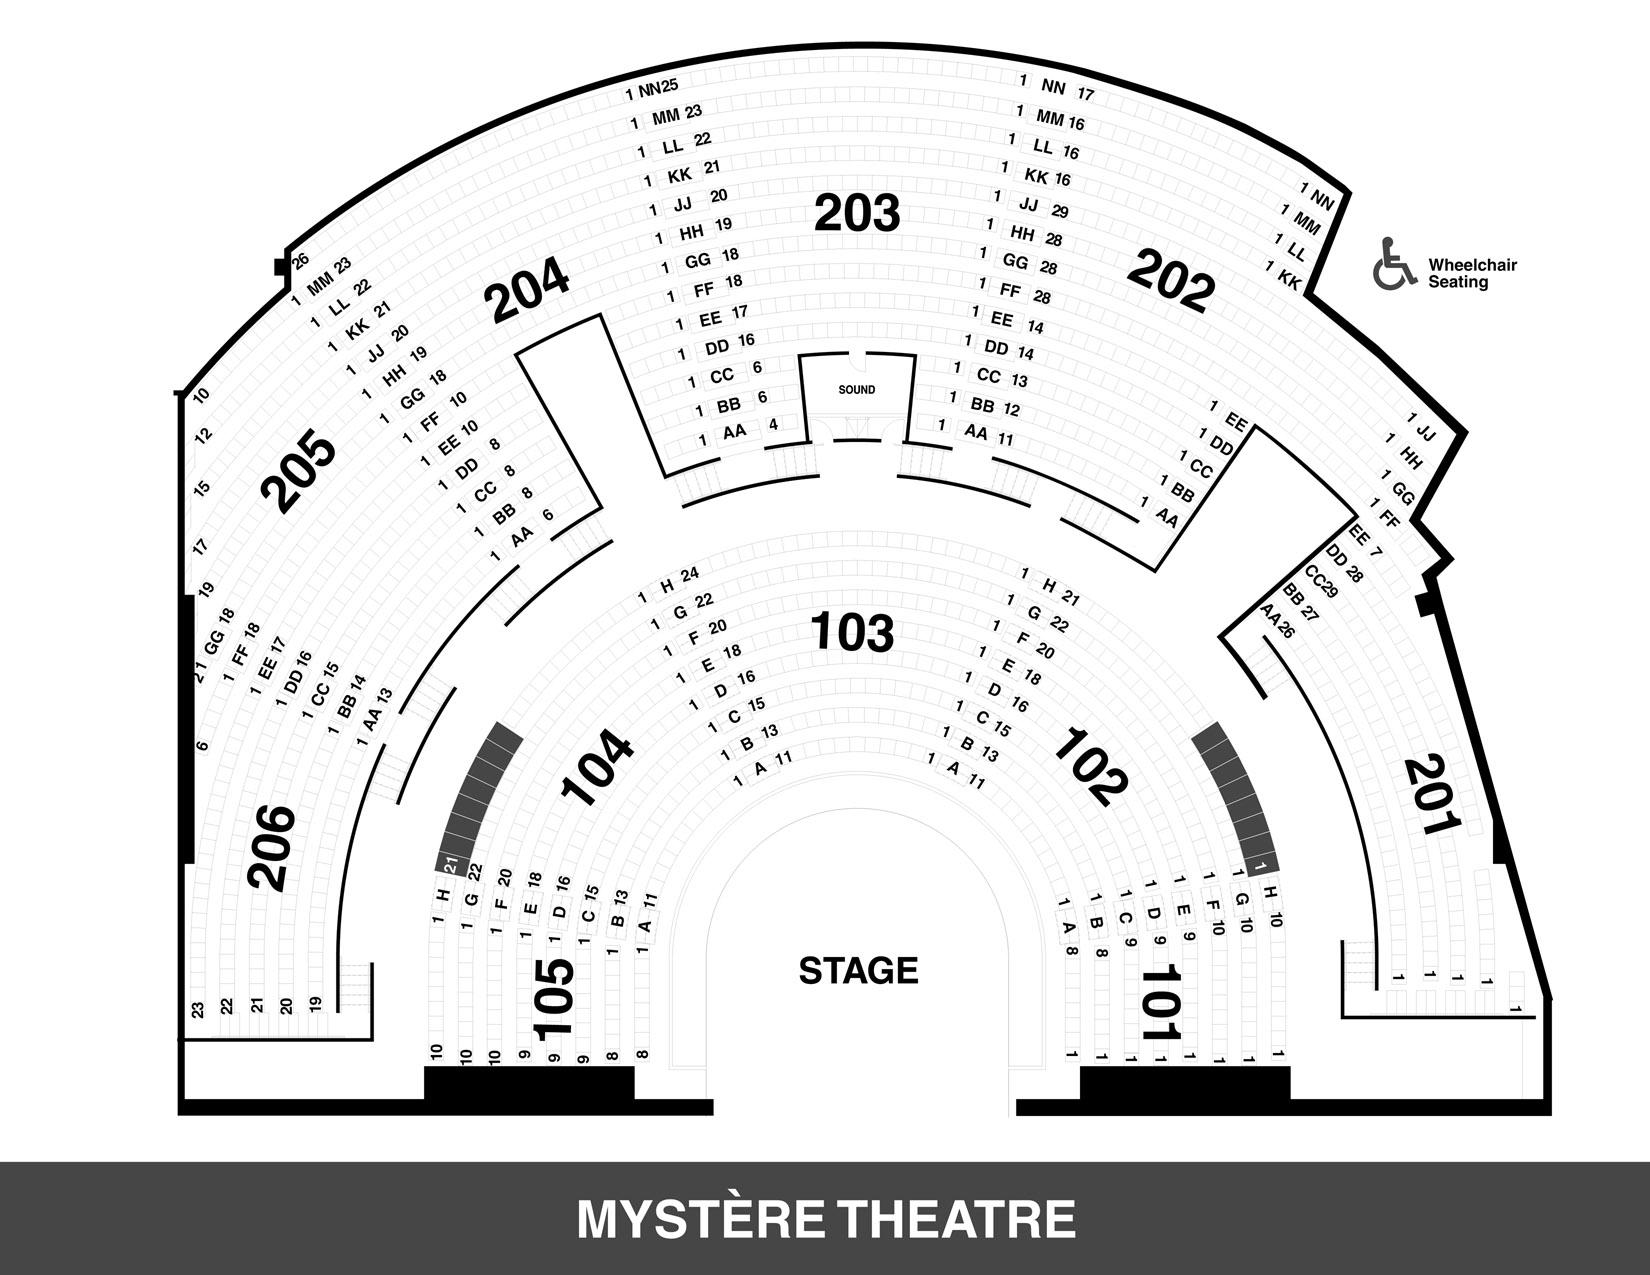 Treasure island las vegas las vegas tickets schedule seating